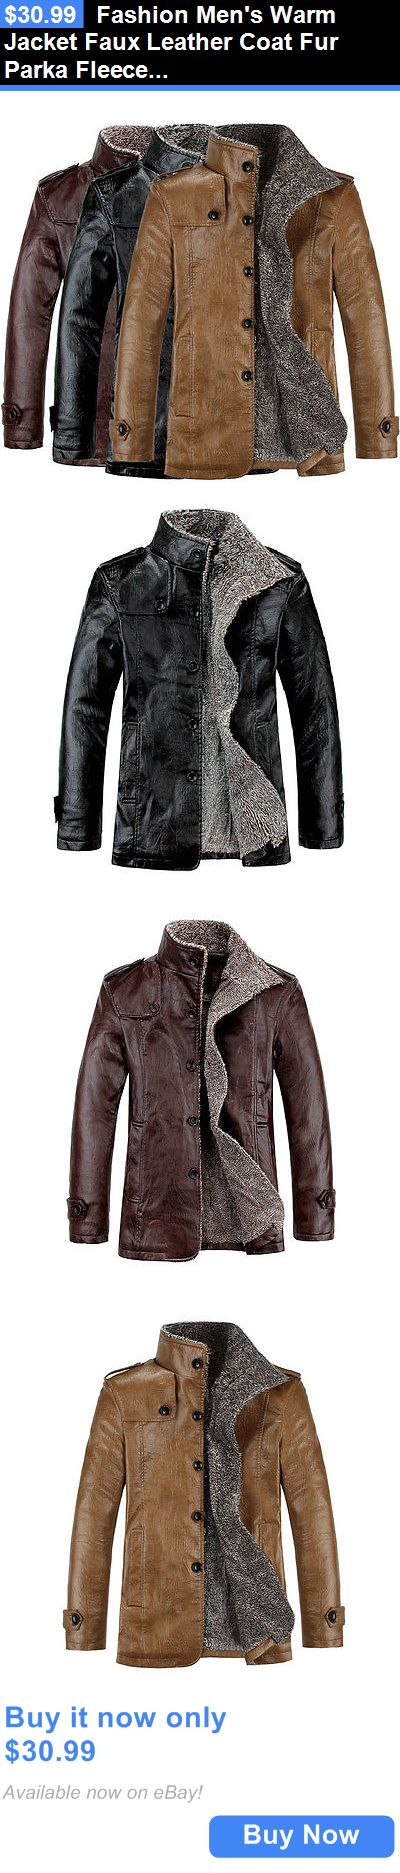 Men Coats And Jackets: Fashion Mens Warm Jacket Faux Leather Coat Fur Parka Fleece Jacket Slim Coat BUY IT NOW ONLY: $30.99